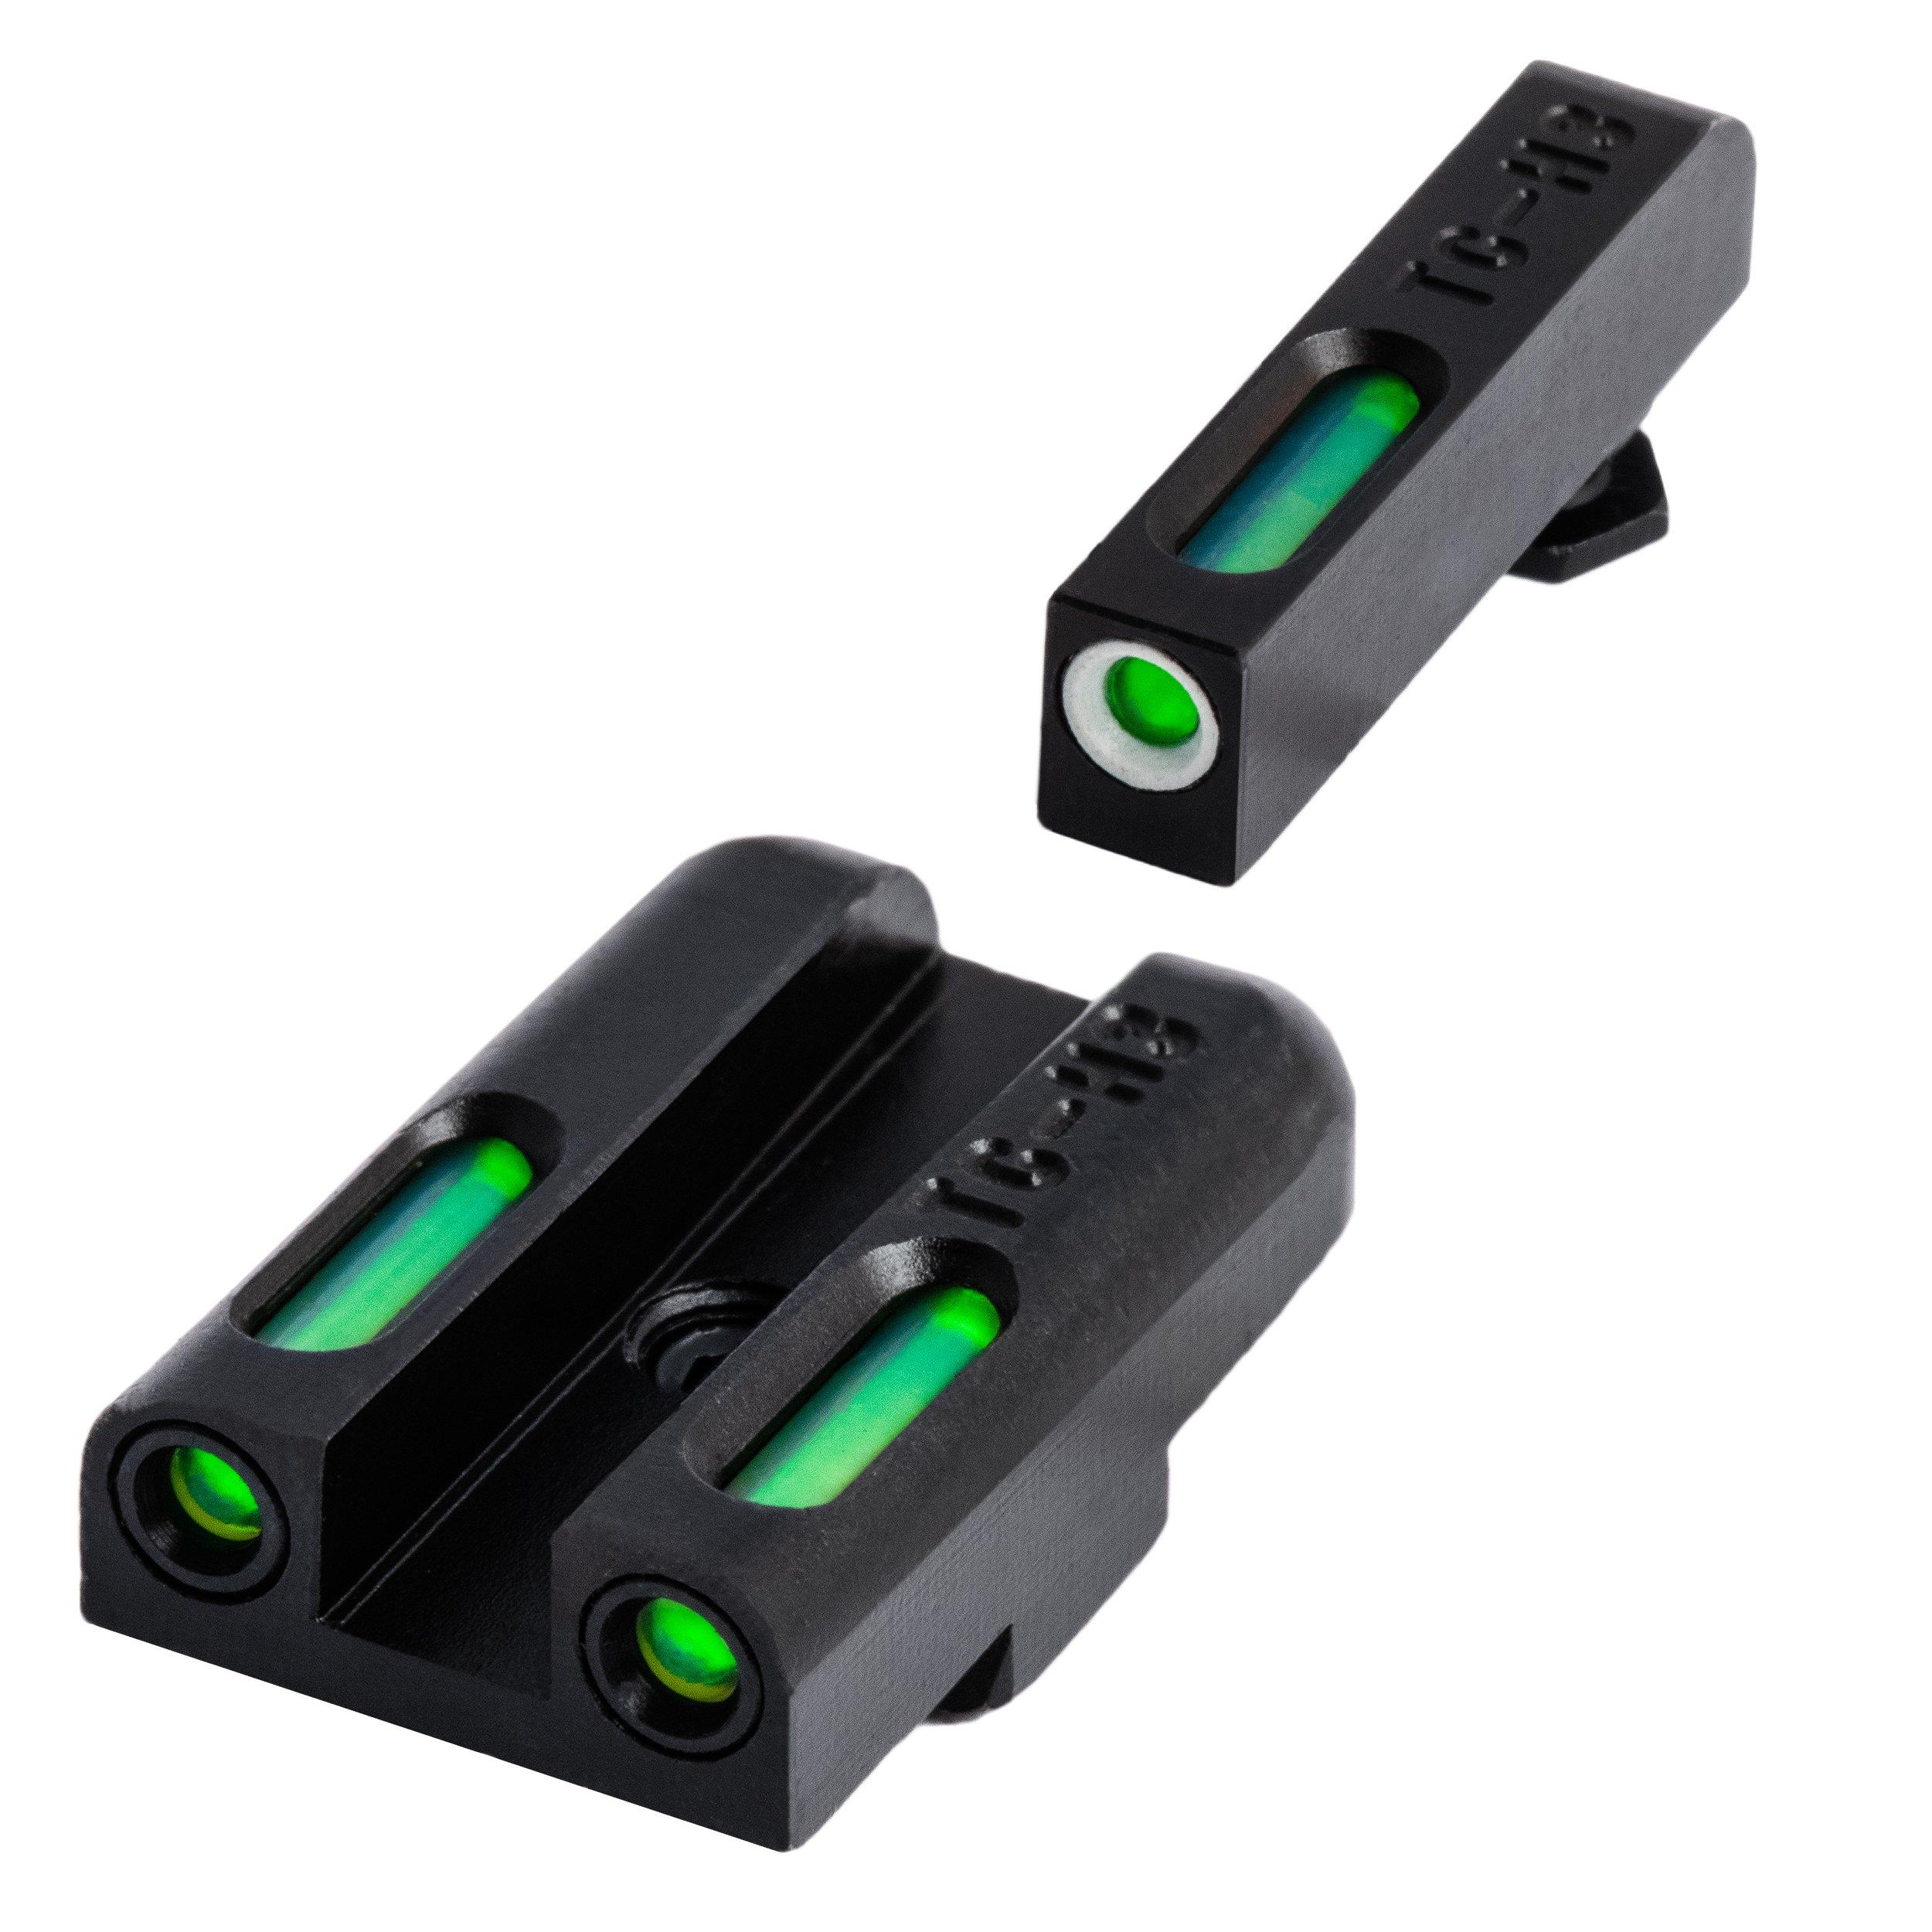 TRUGLO TFX Tritium and Fiber-Optic Xtreme Handgun Sights for Glock Pistols, Glock 42, 43 by TRUGLO